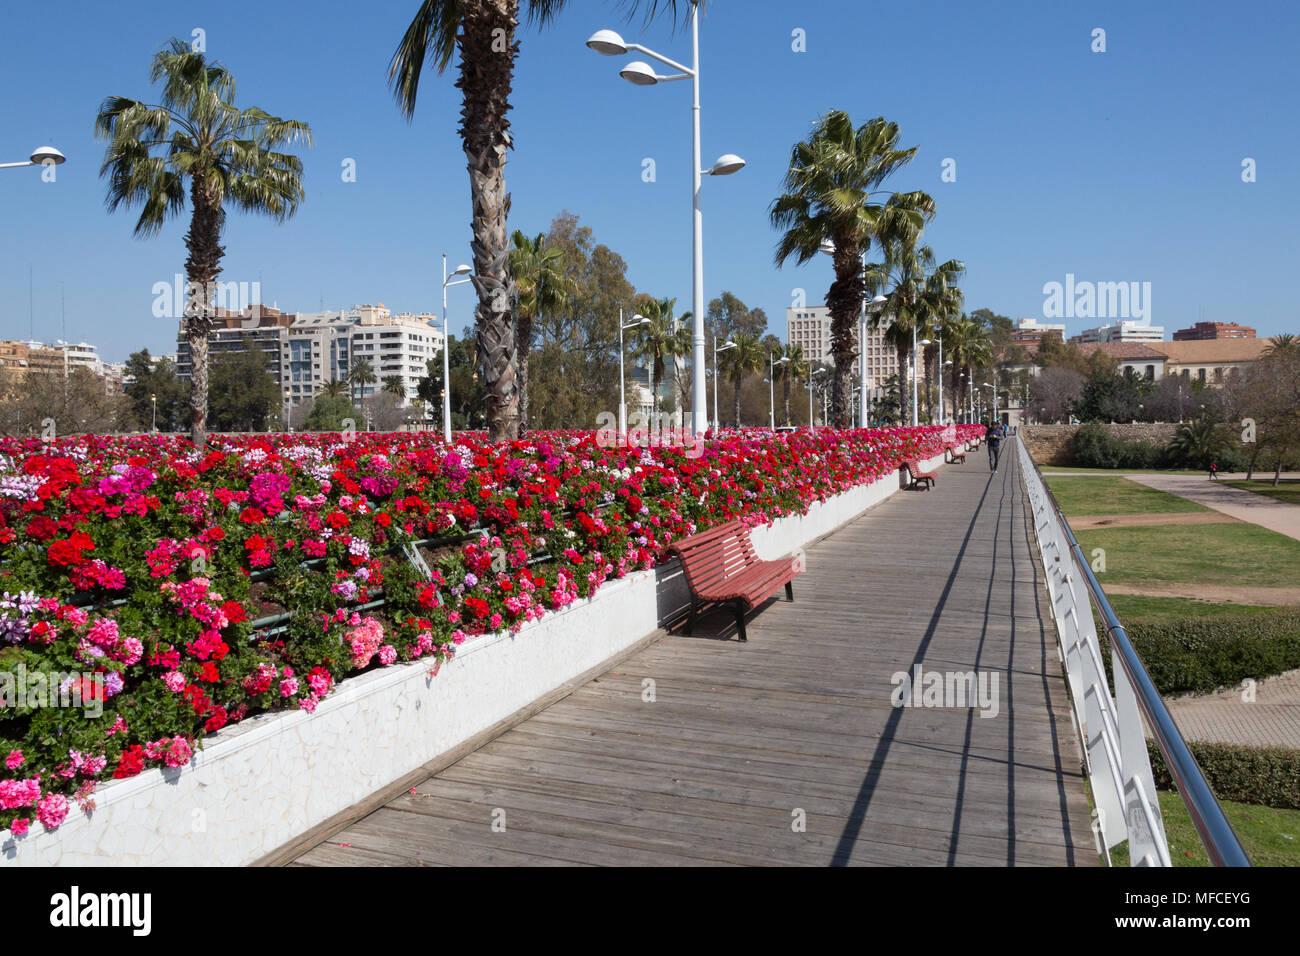 Valencia Calendar.Valencia Spain March 16 2015 The Highlight Of Valencia S